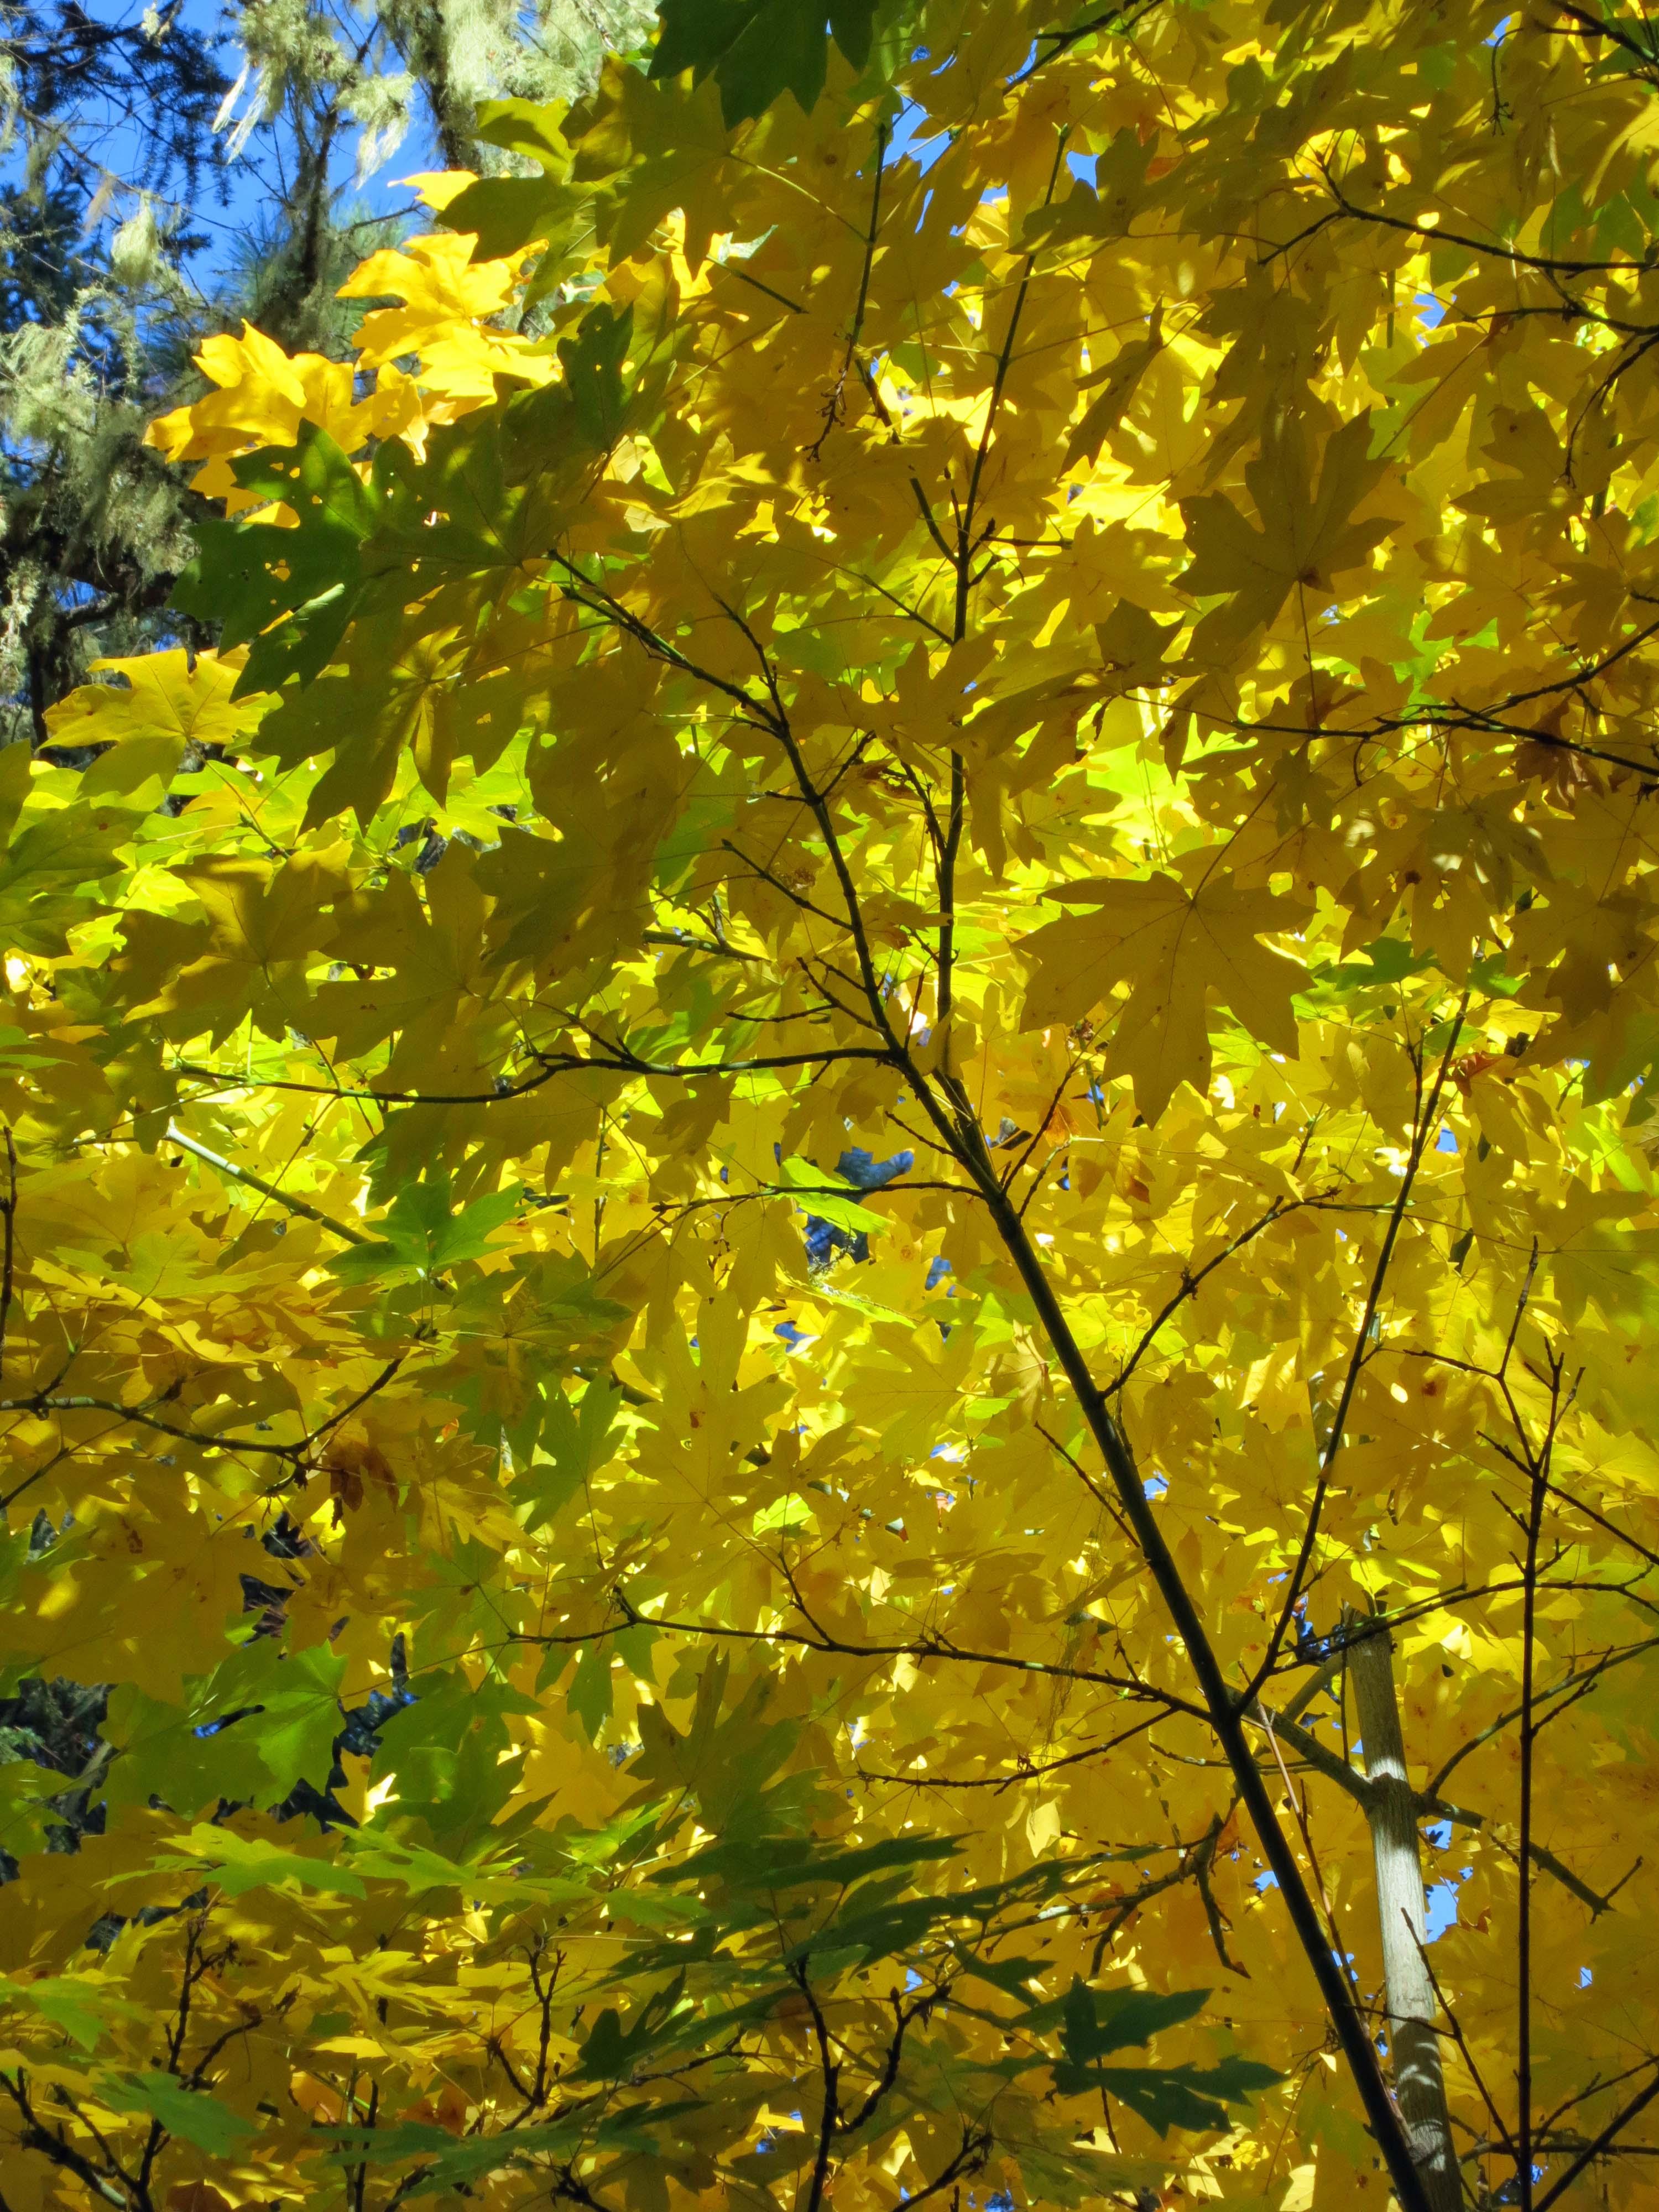 Photo of Oregon Maple by Curtis Mekemson.